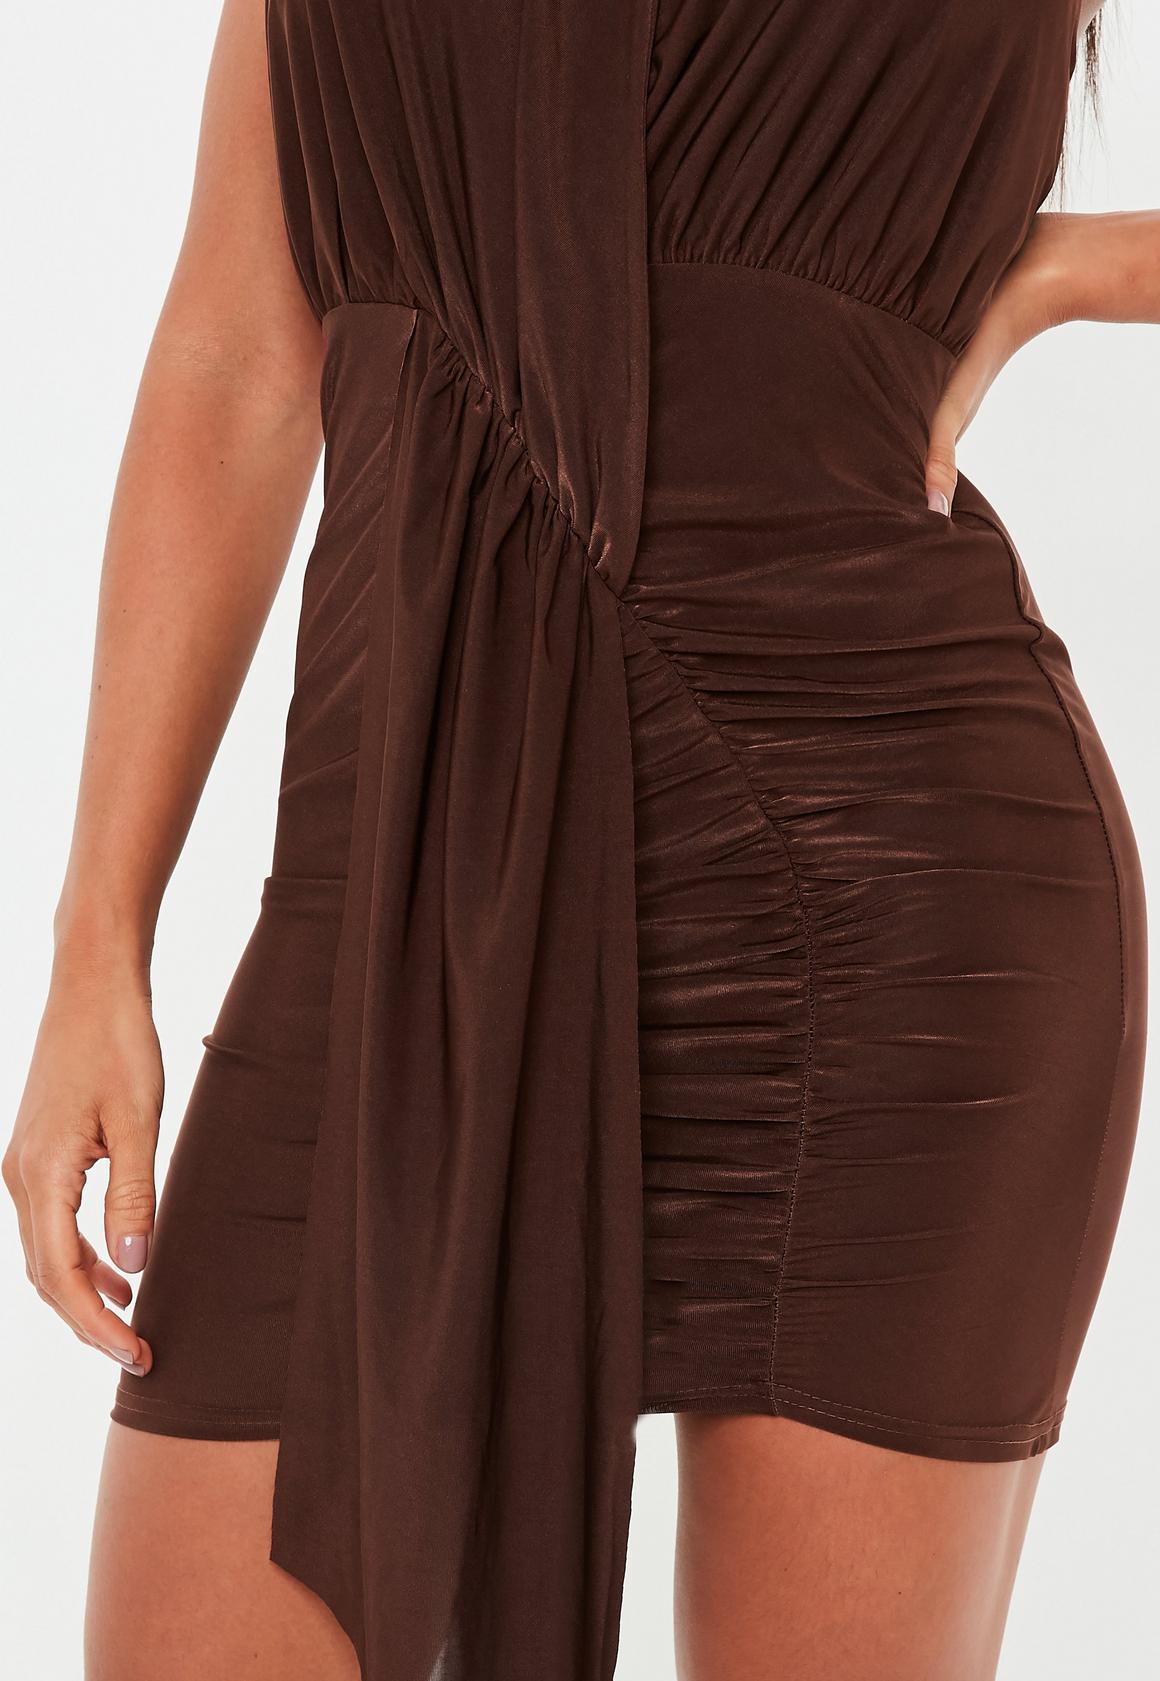 Missguided - robe dos-nu courte tissu drappé  - 3